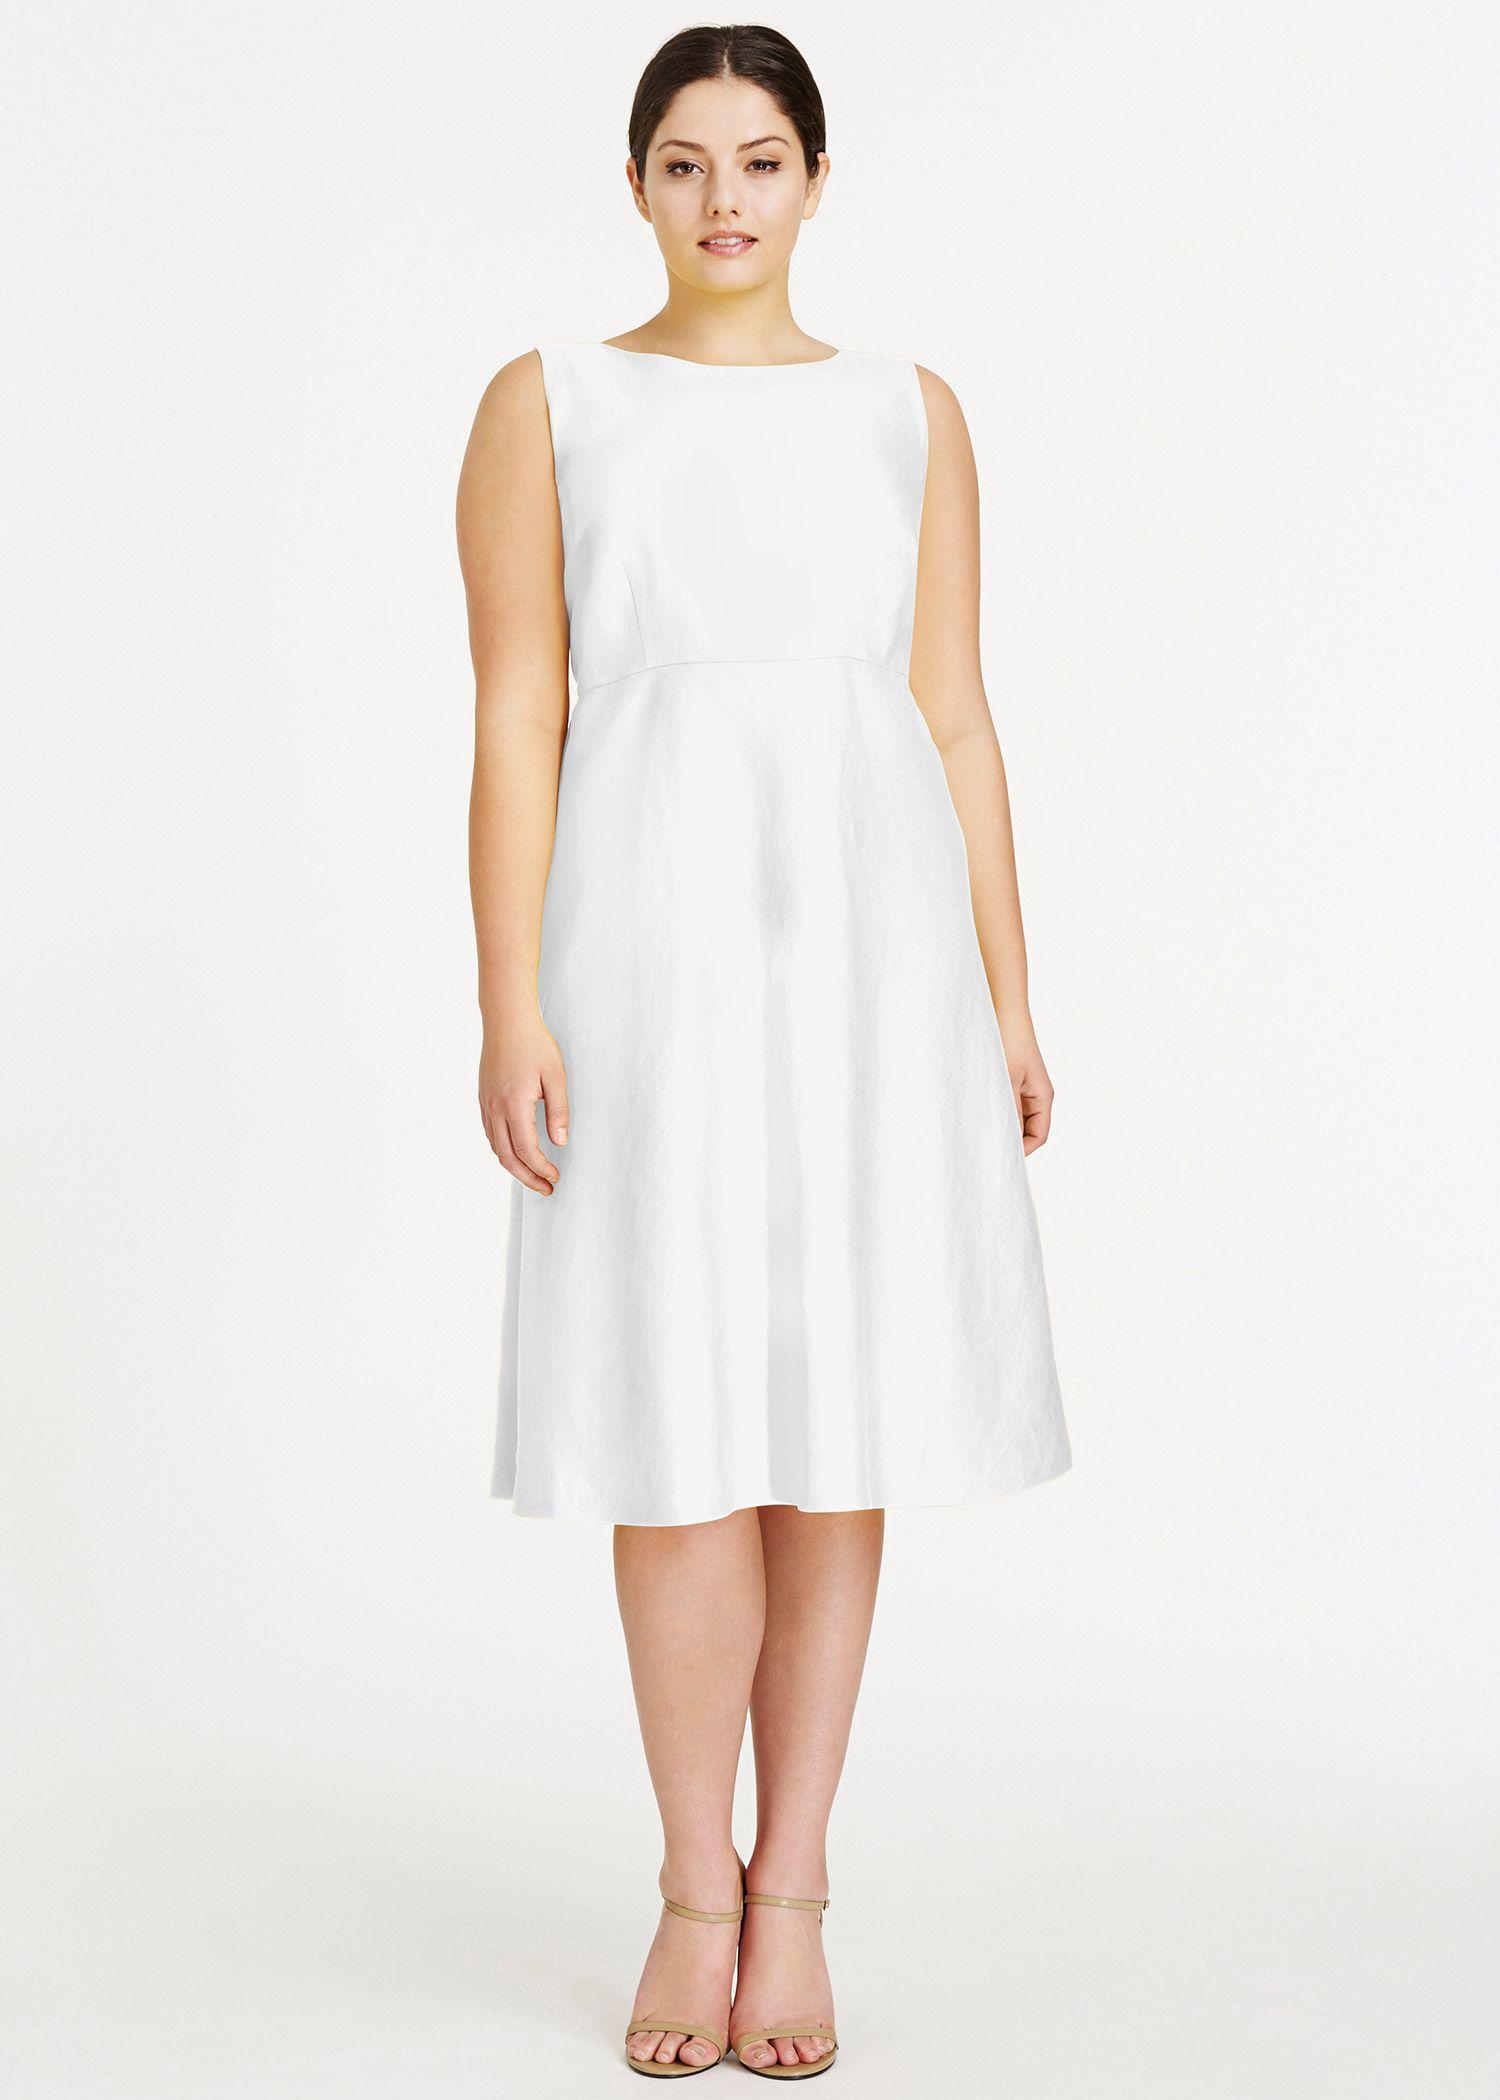 Plus size white wedding dress  Plus Sized Wedding DressesFlattering Styles  Wedding dress